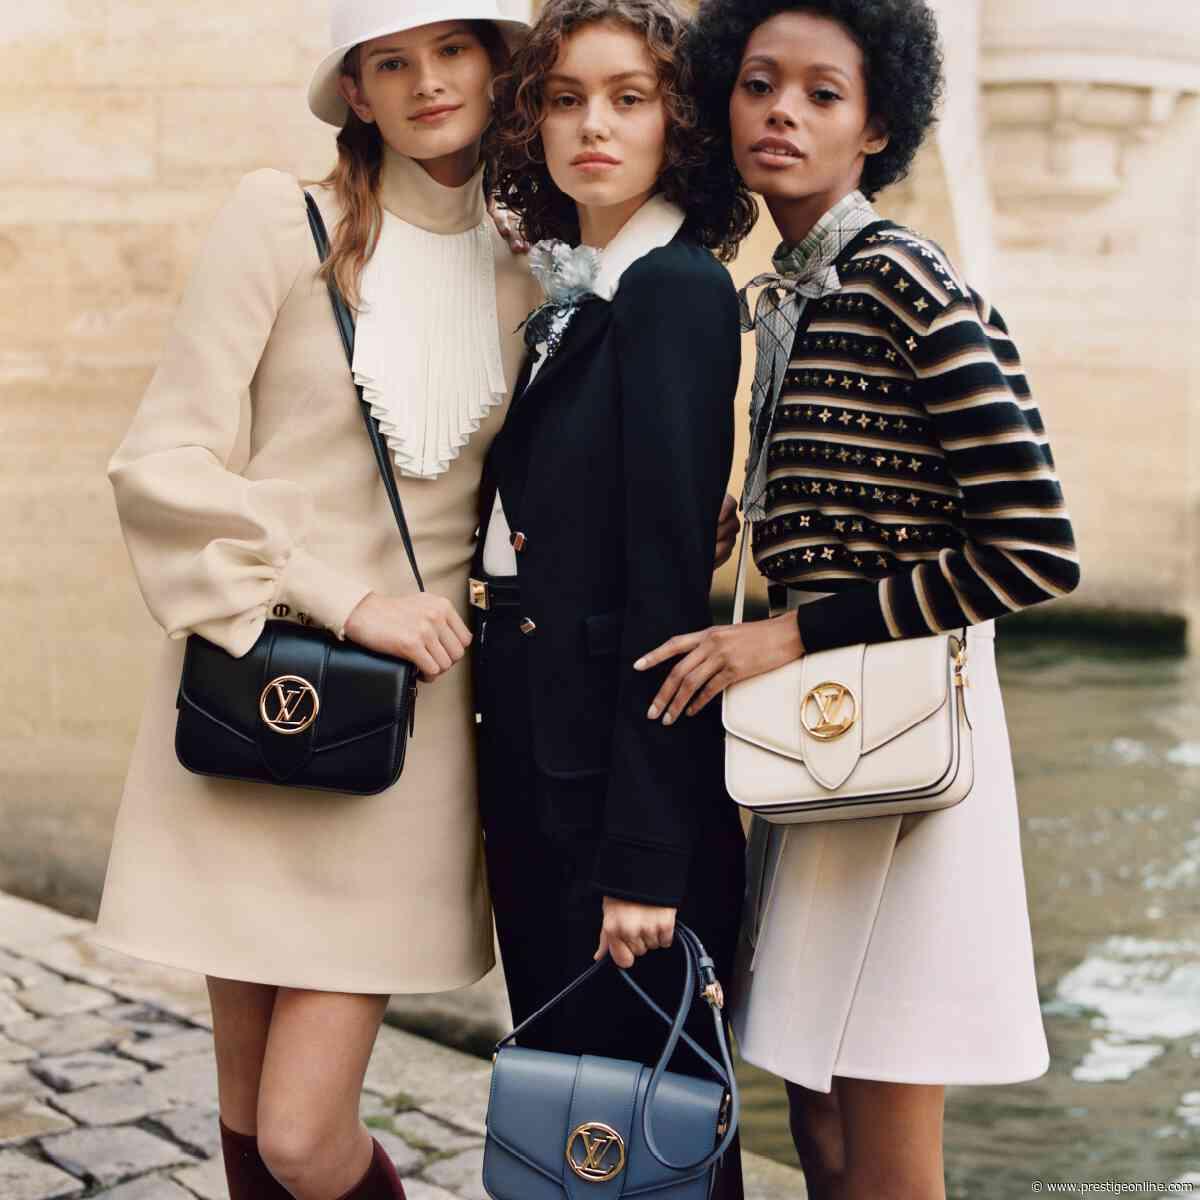 Most Coveted: De Beers, Saint Laurent, Louis Vuitton and More - Prestige Online